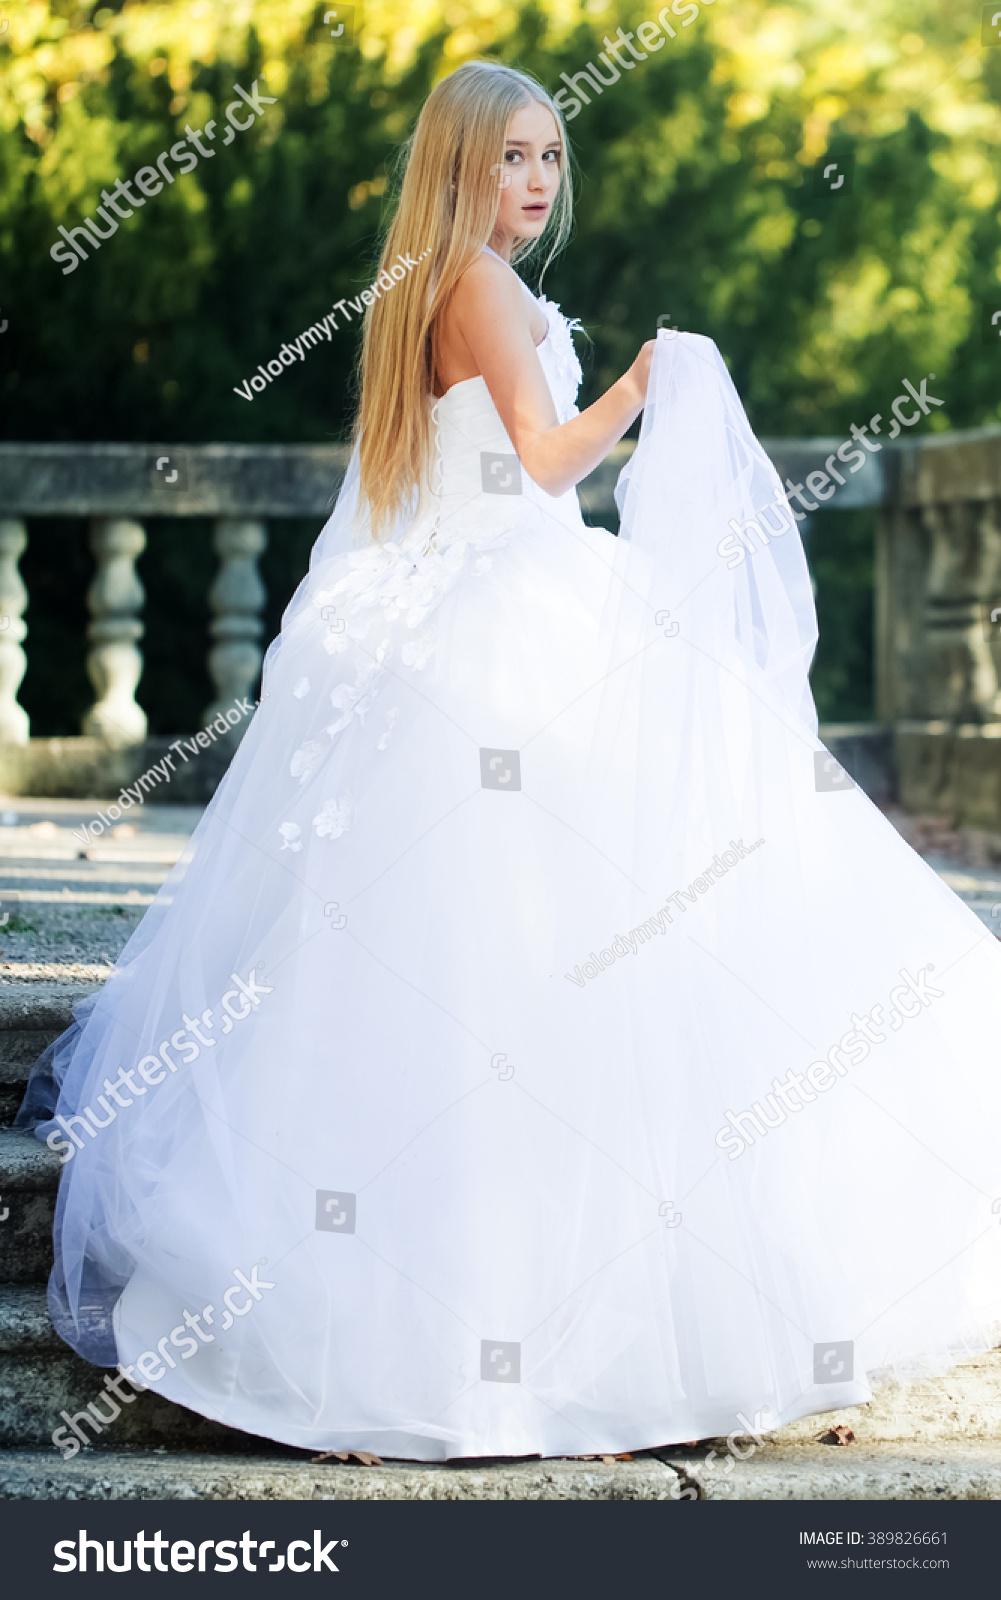 Pretty Sensual Thoughtful Young Bride Girl Stock Photo 389826661 ...